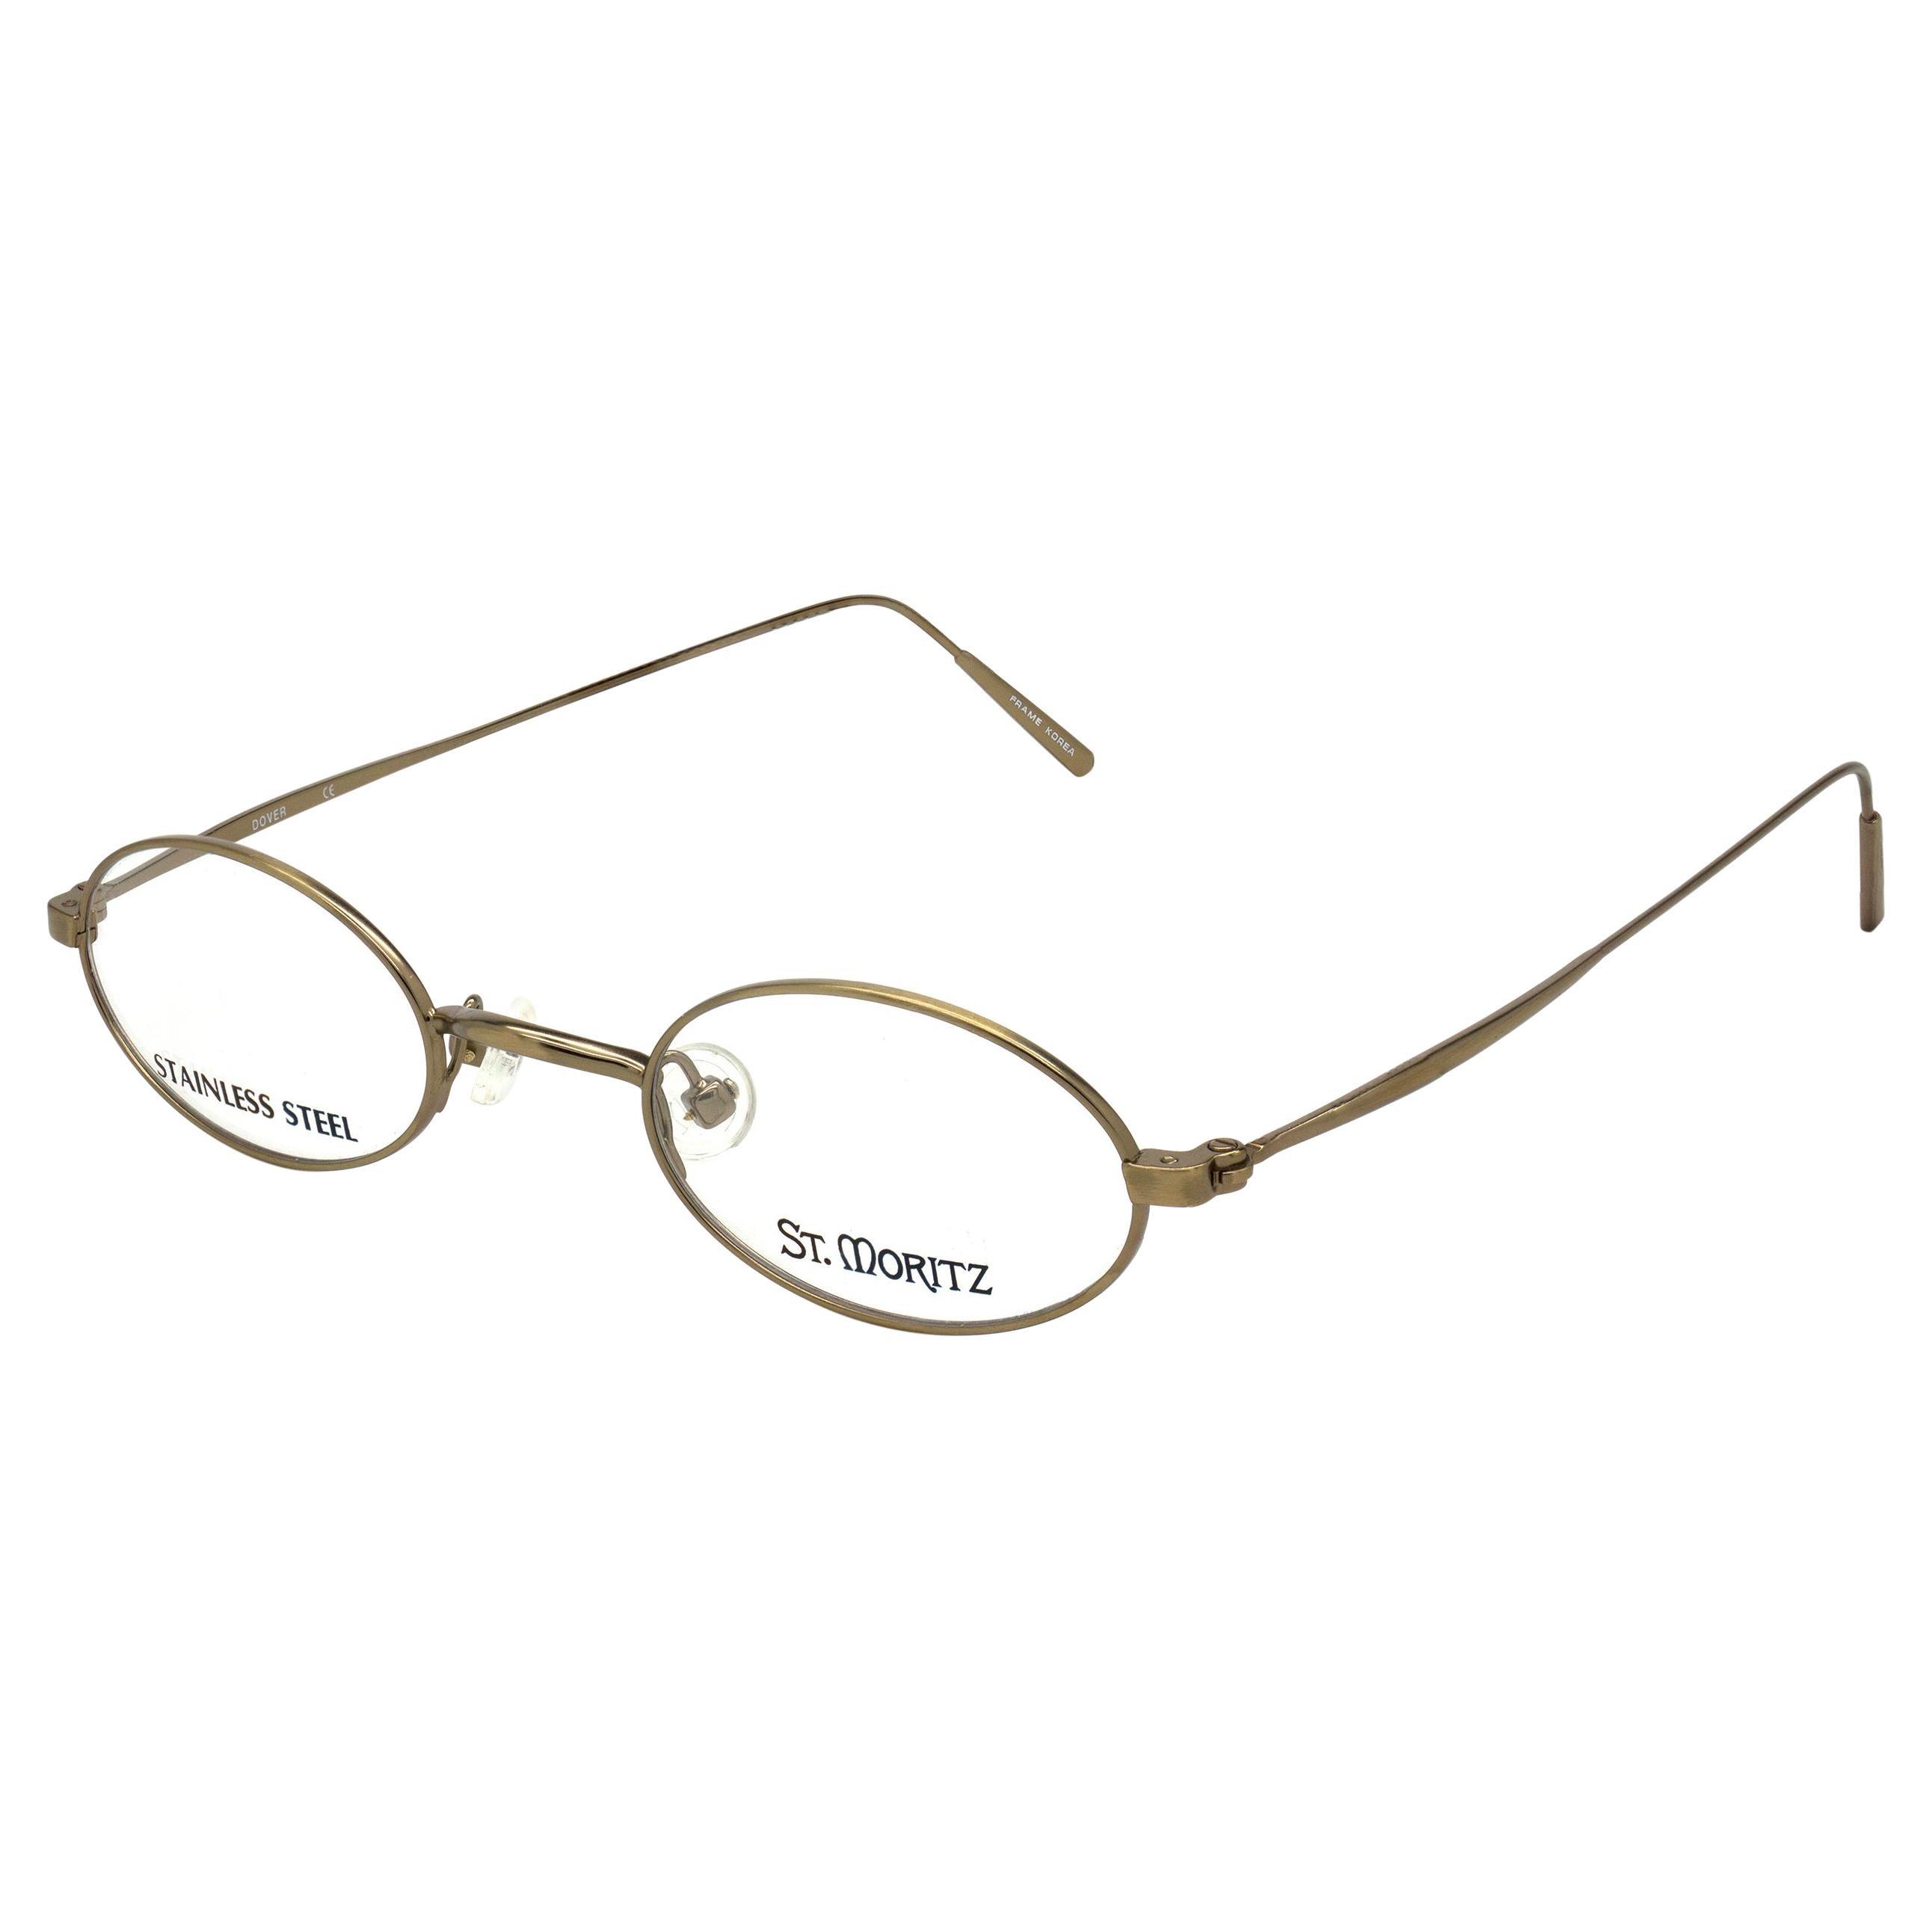 St. Moritz victorian vintage eyeglasses